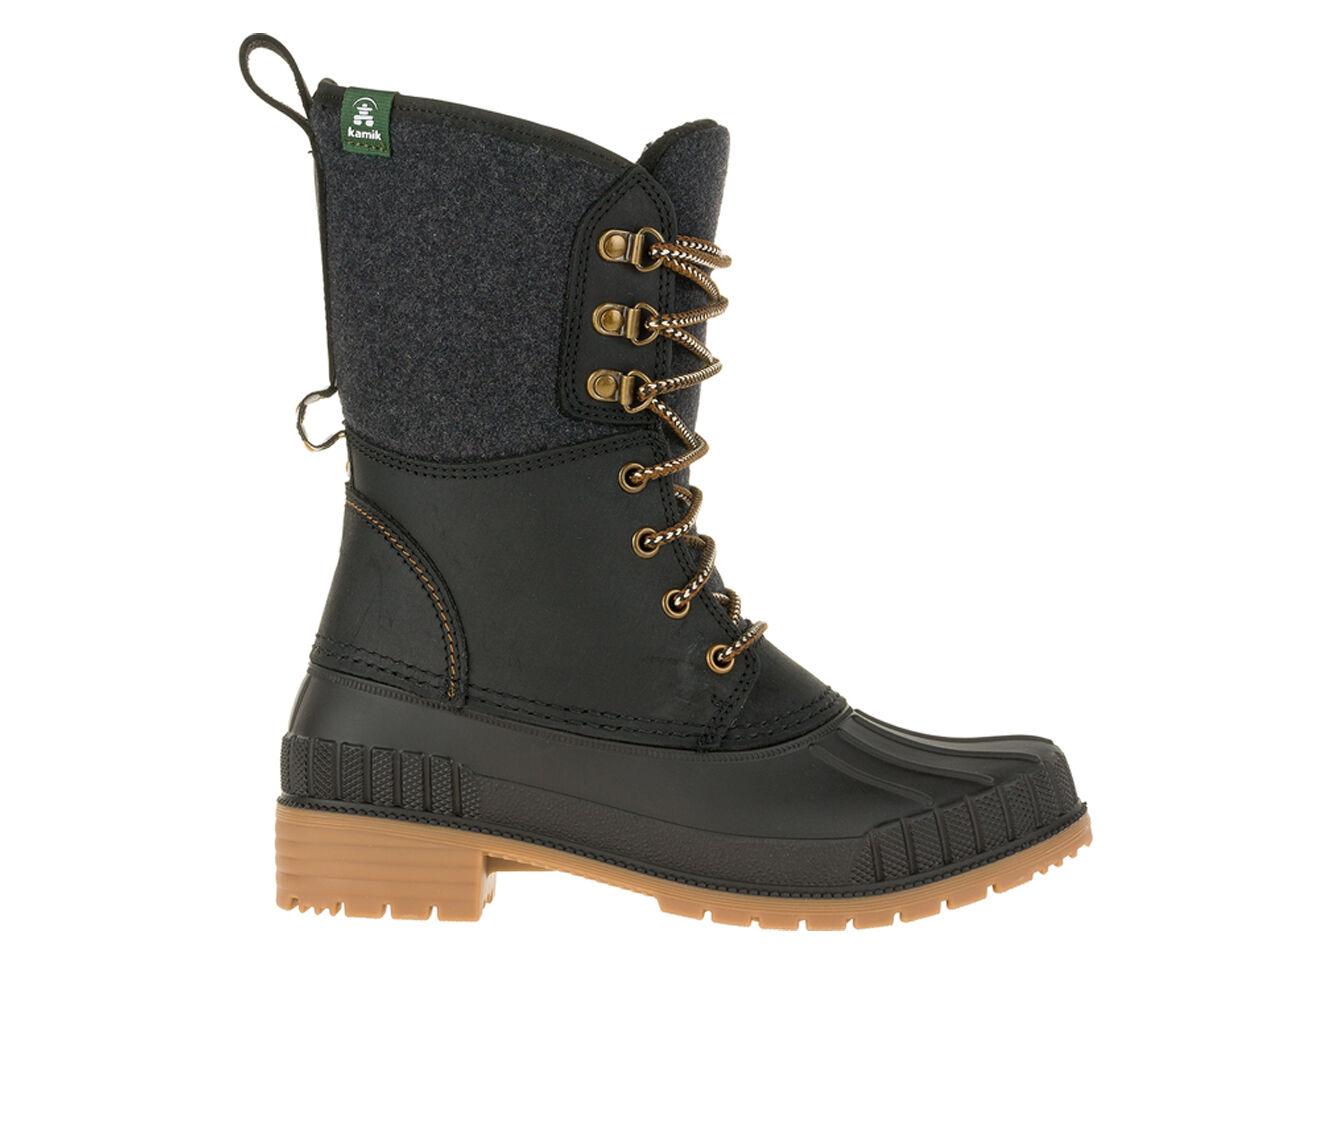 Women's Kamik Sienna Duck Boots   Shoe